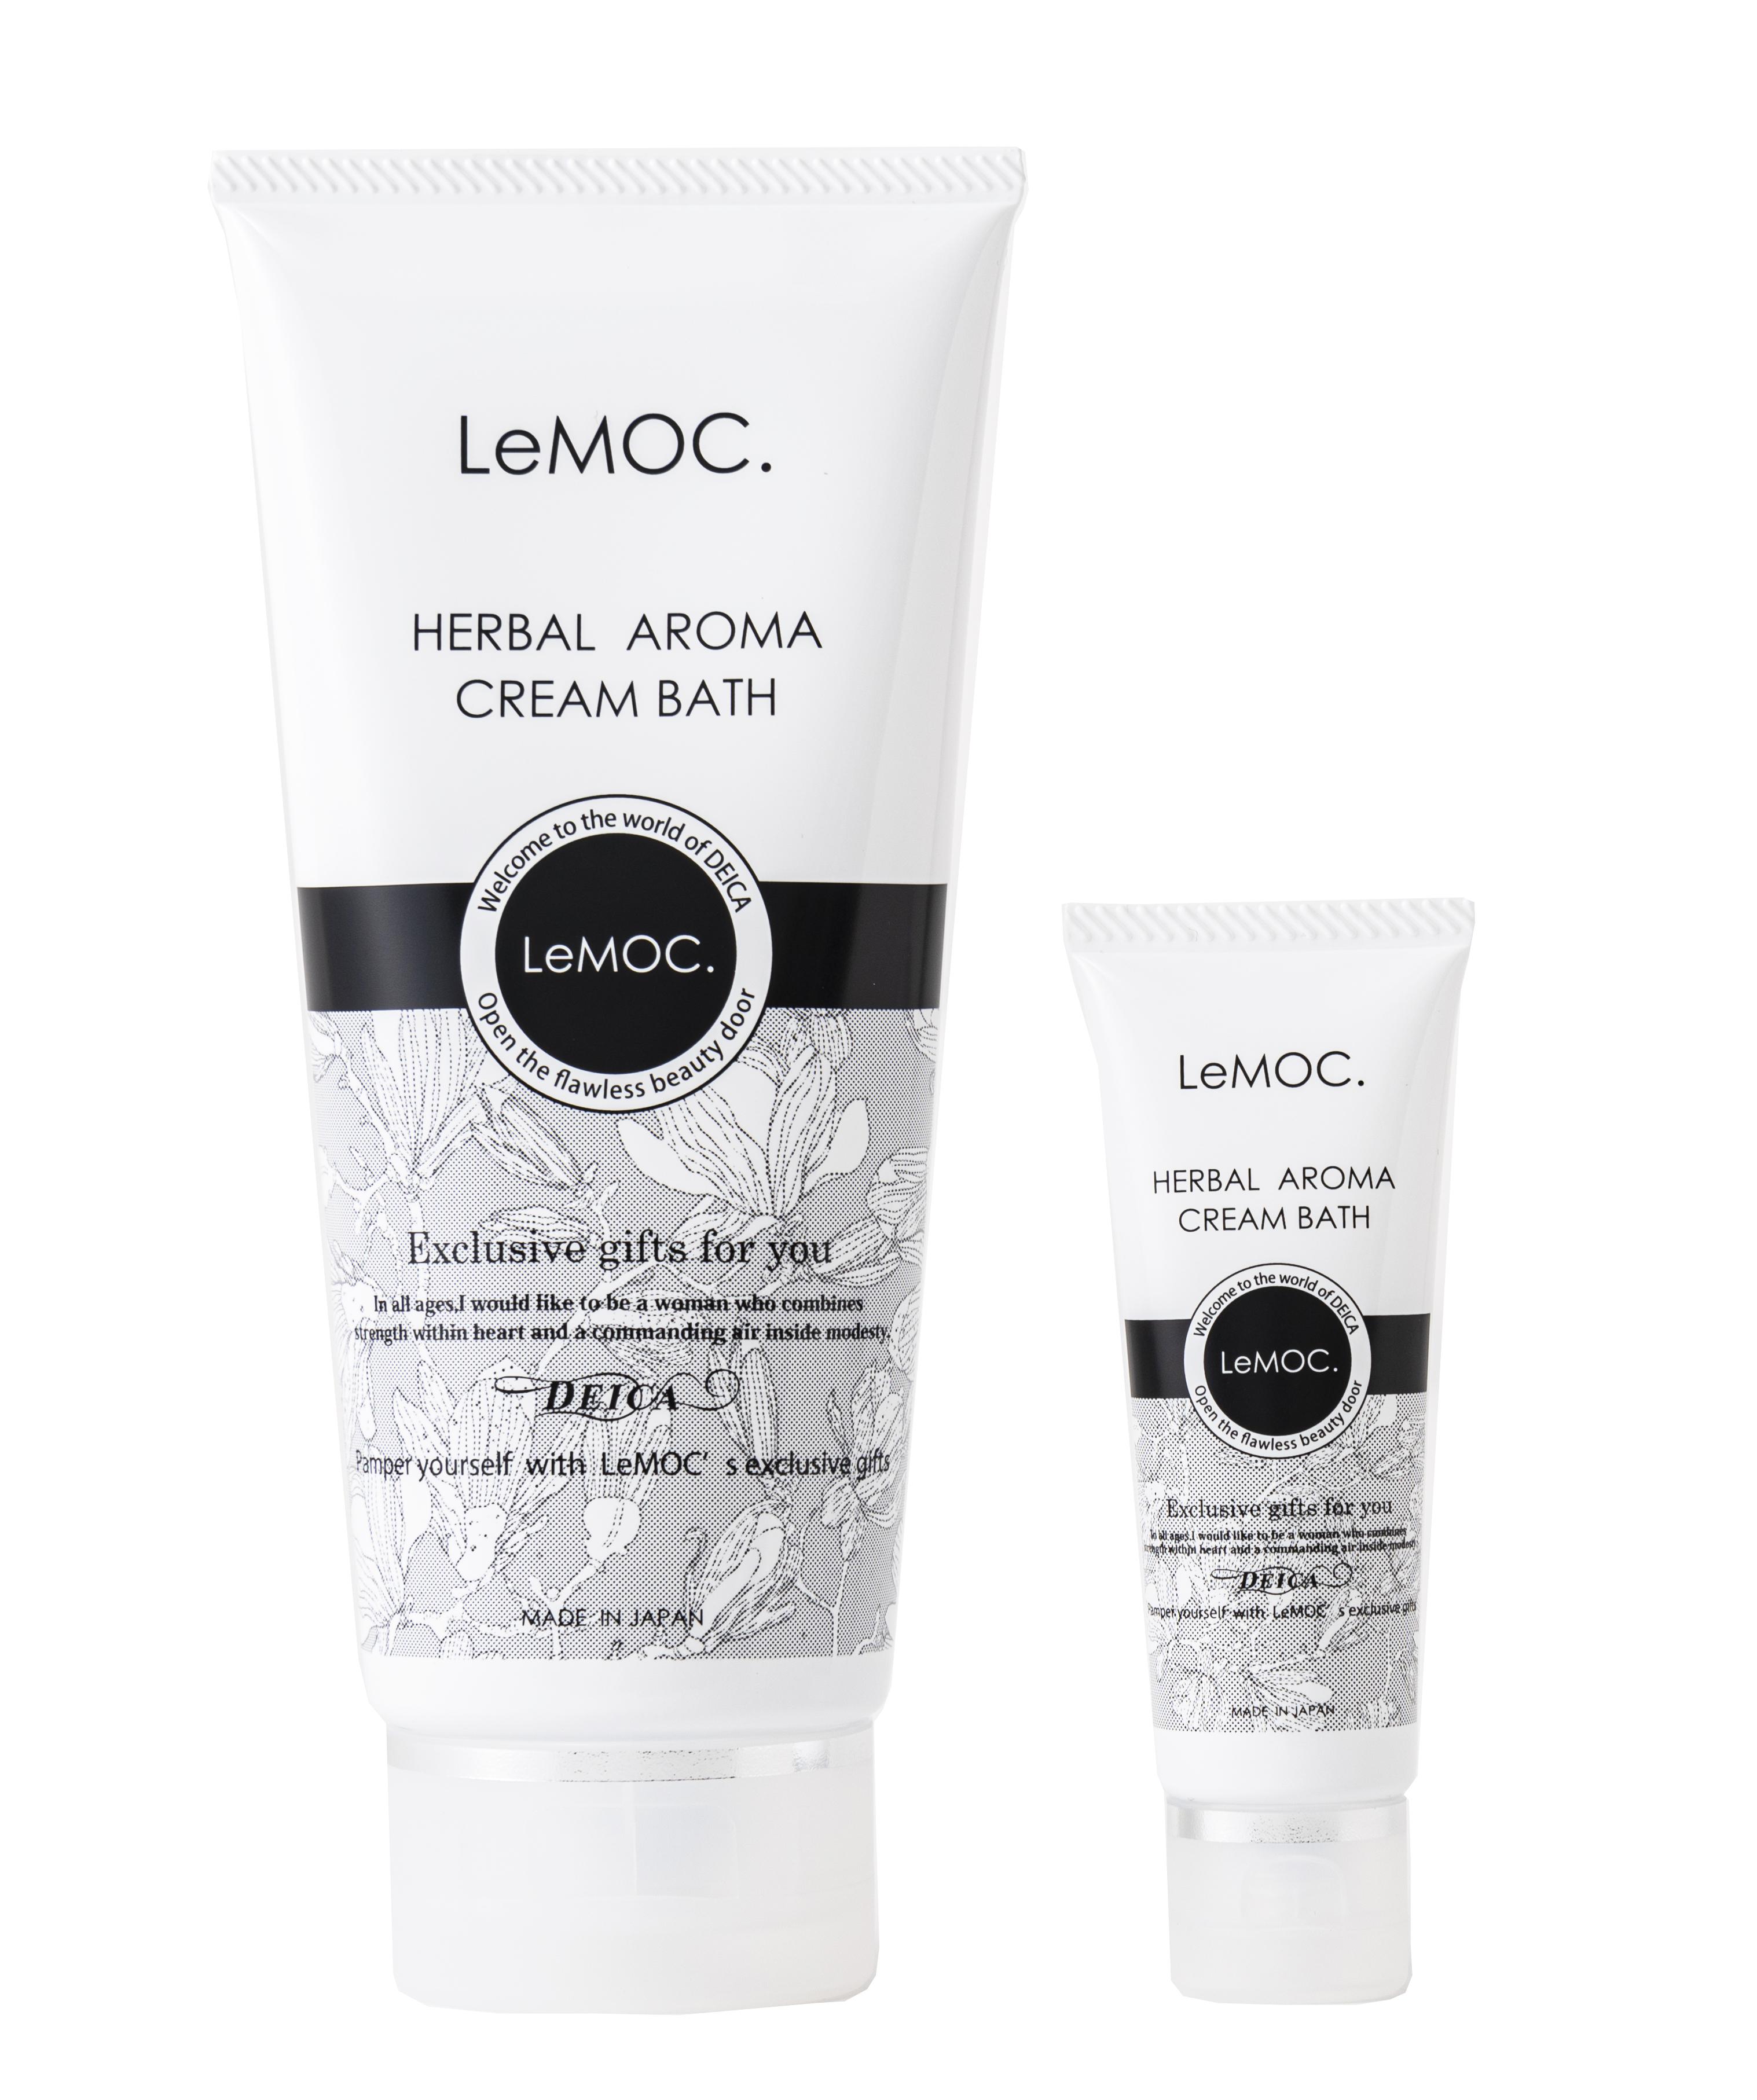 LeMOC.ハーバルアロマ クリームバス商品